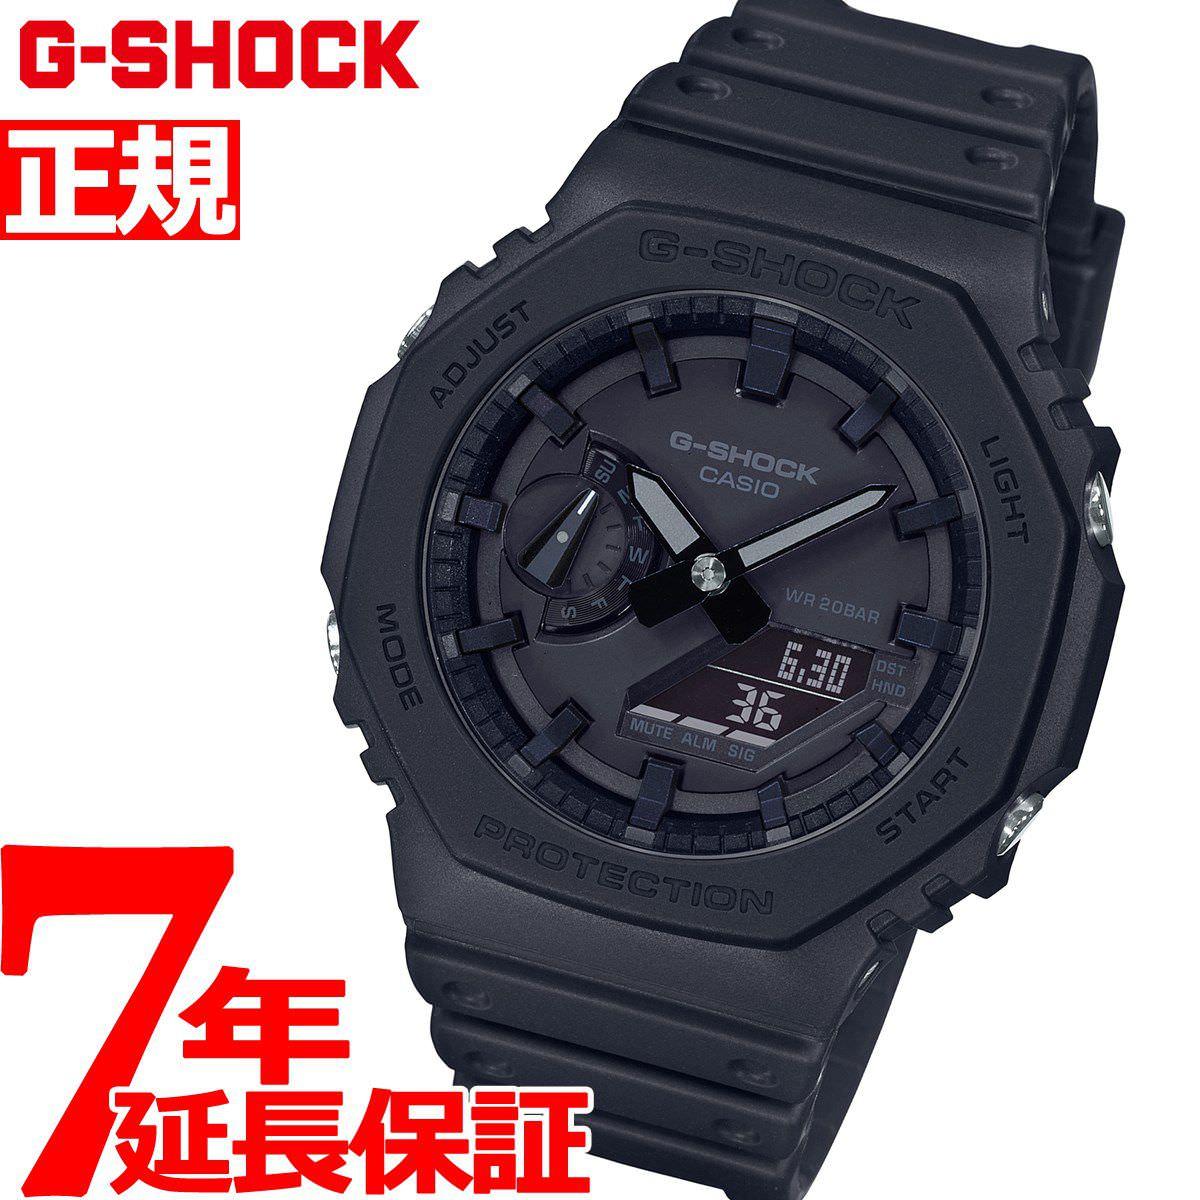 Gショック G-SHOCK 腕時計 メンズ GA-2100-1A1JF ジーショック